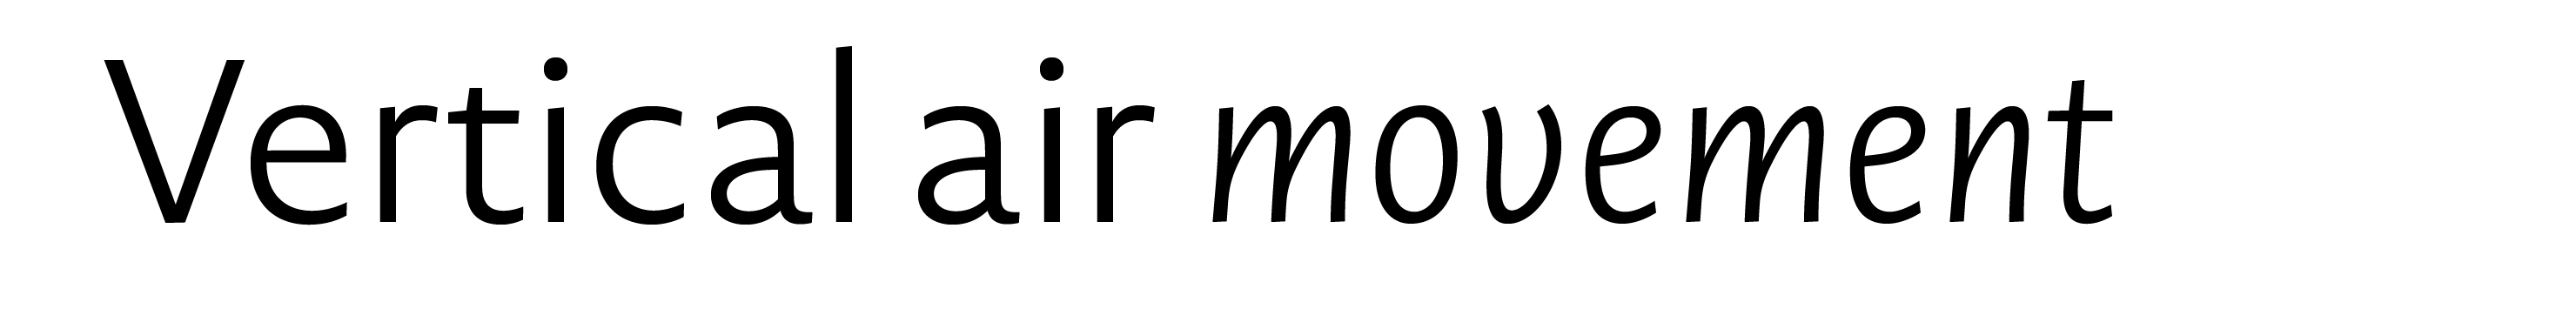 Typeface Novel Sans D02 Atlas Font Foundry